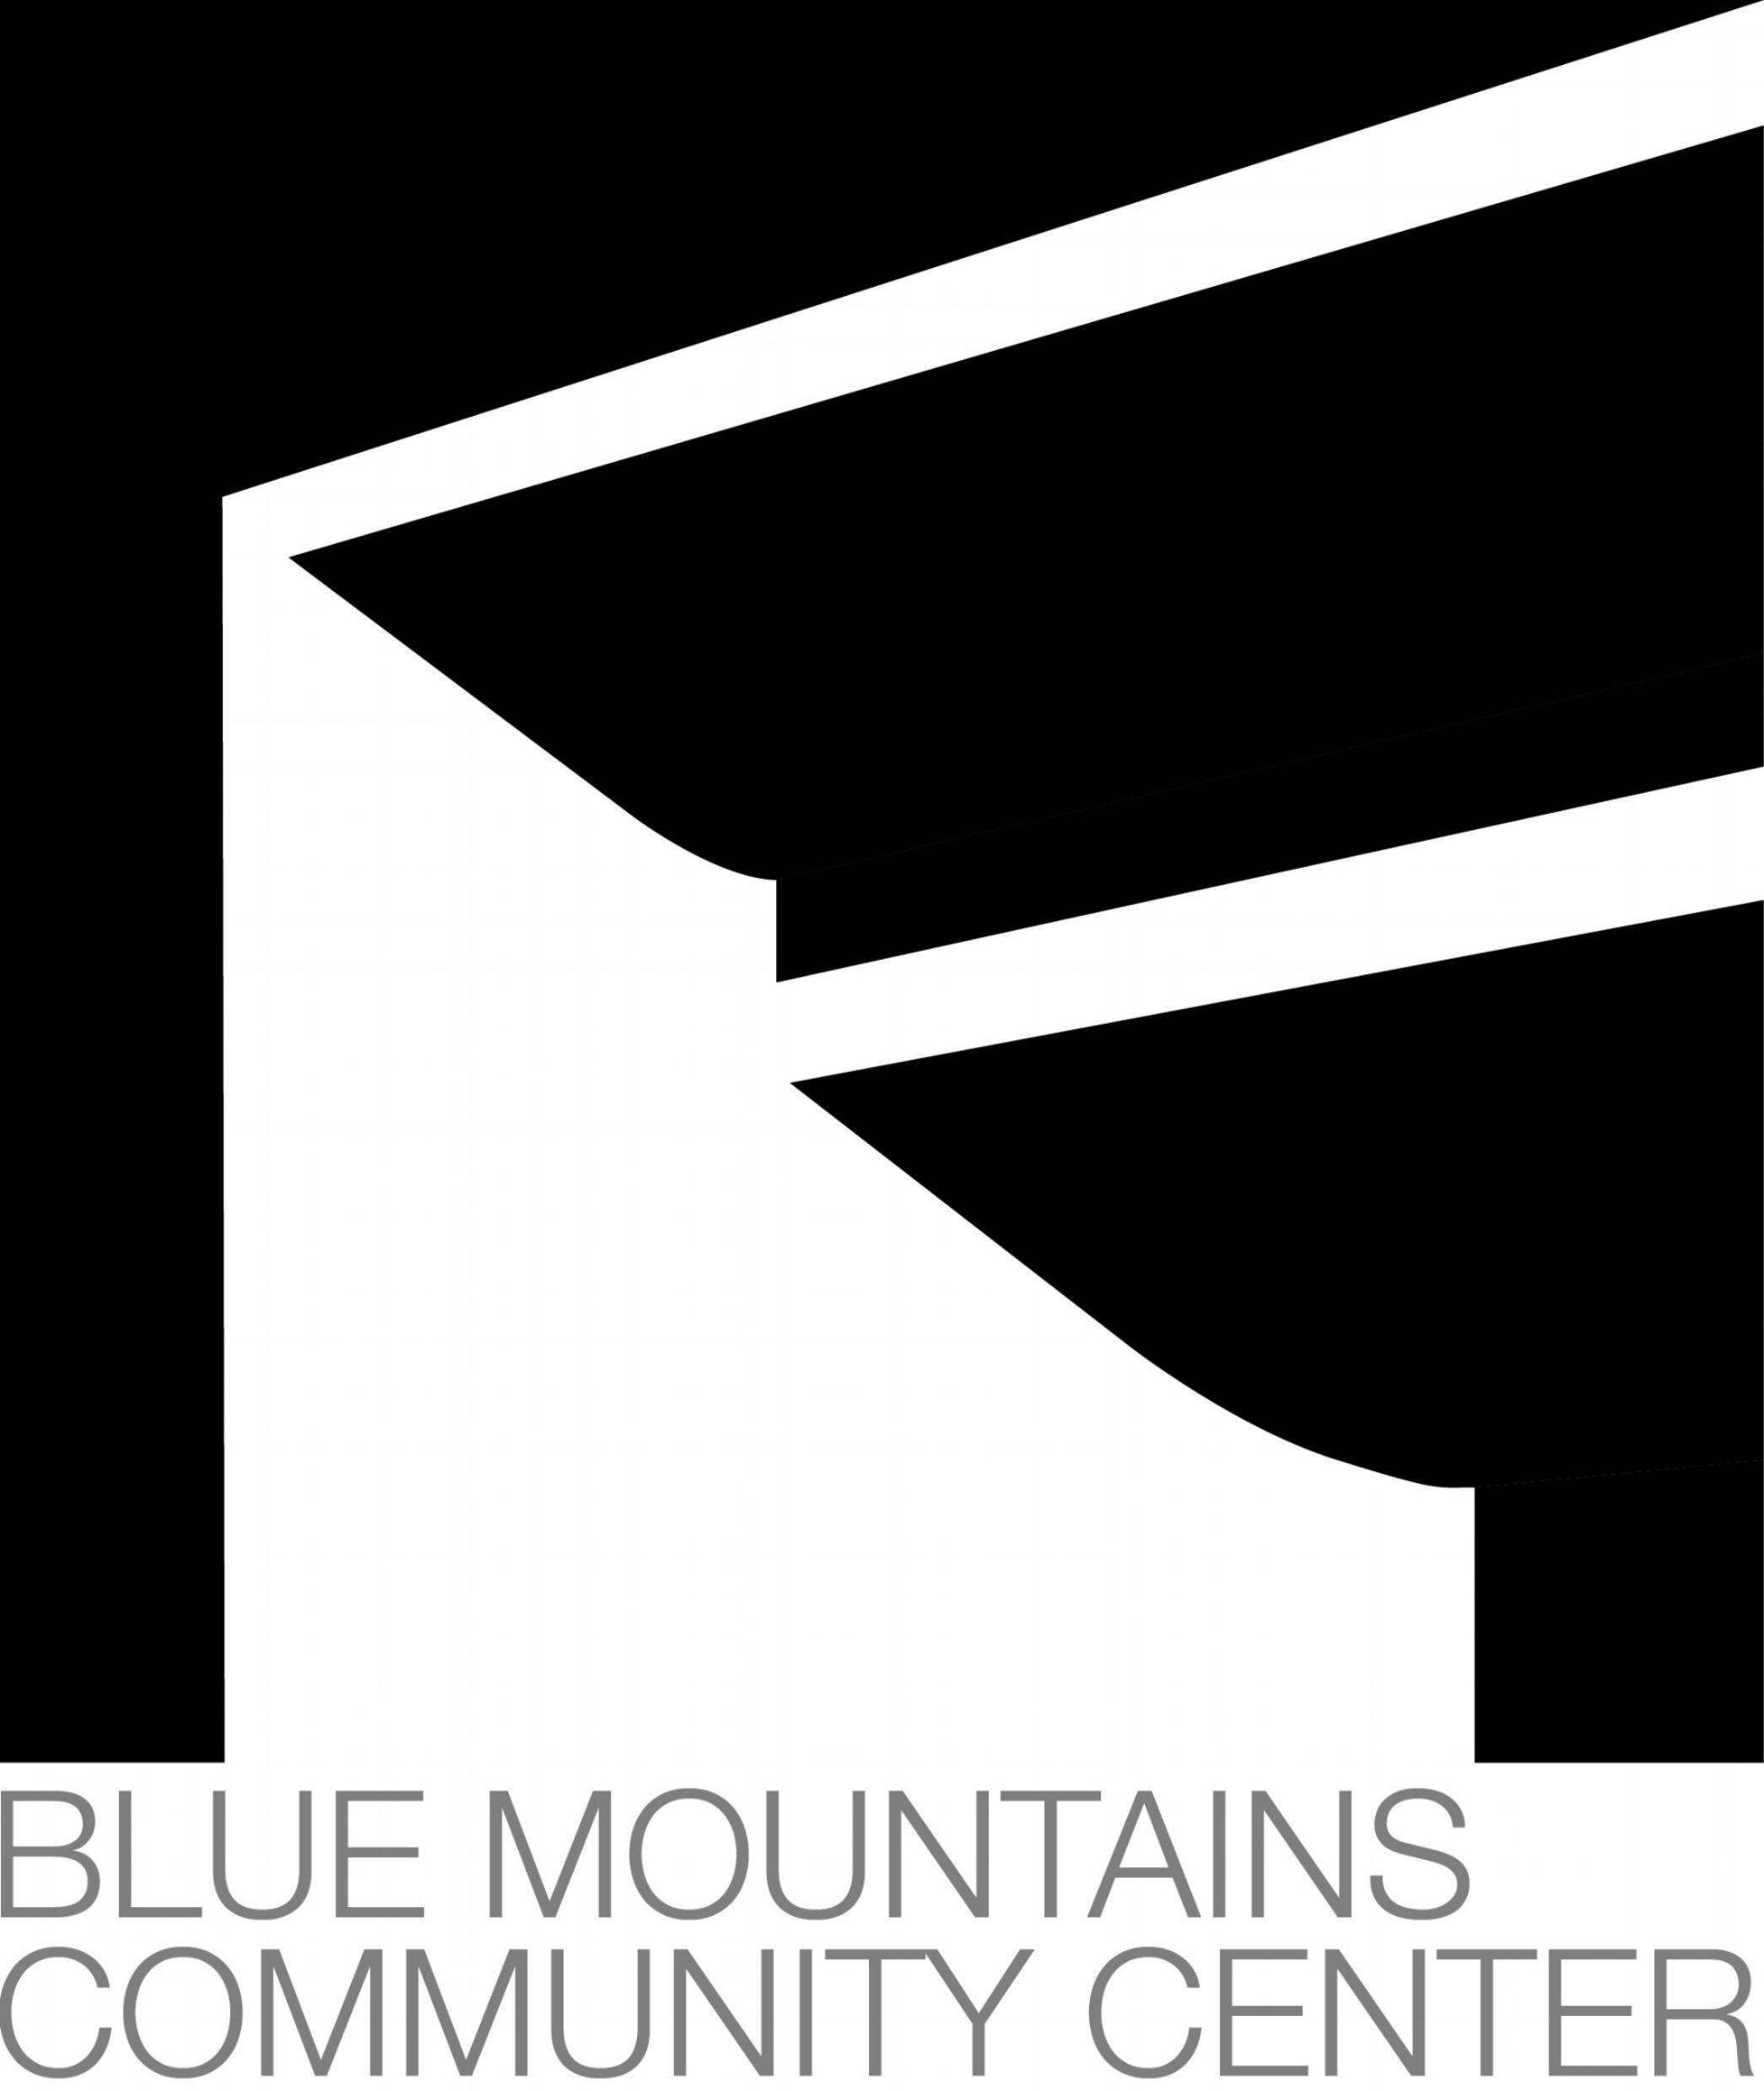 Blue Mountains Community Center-09.jpg